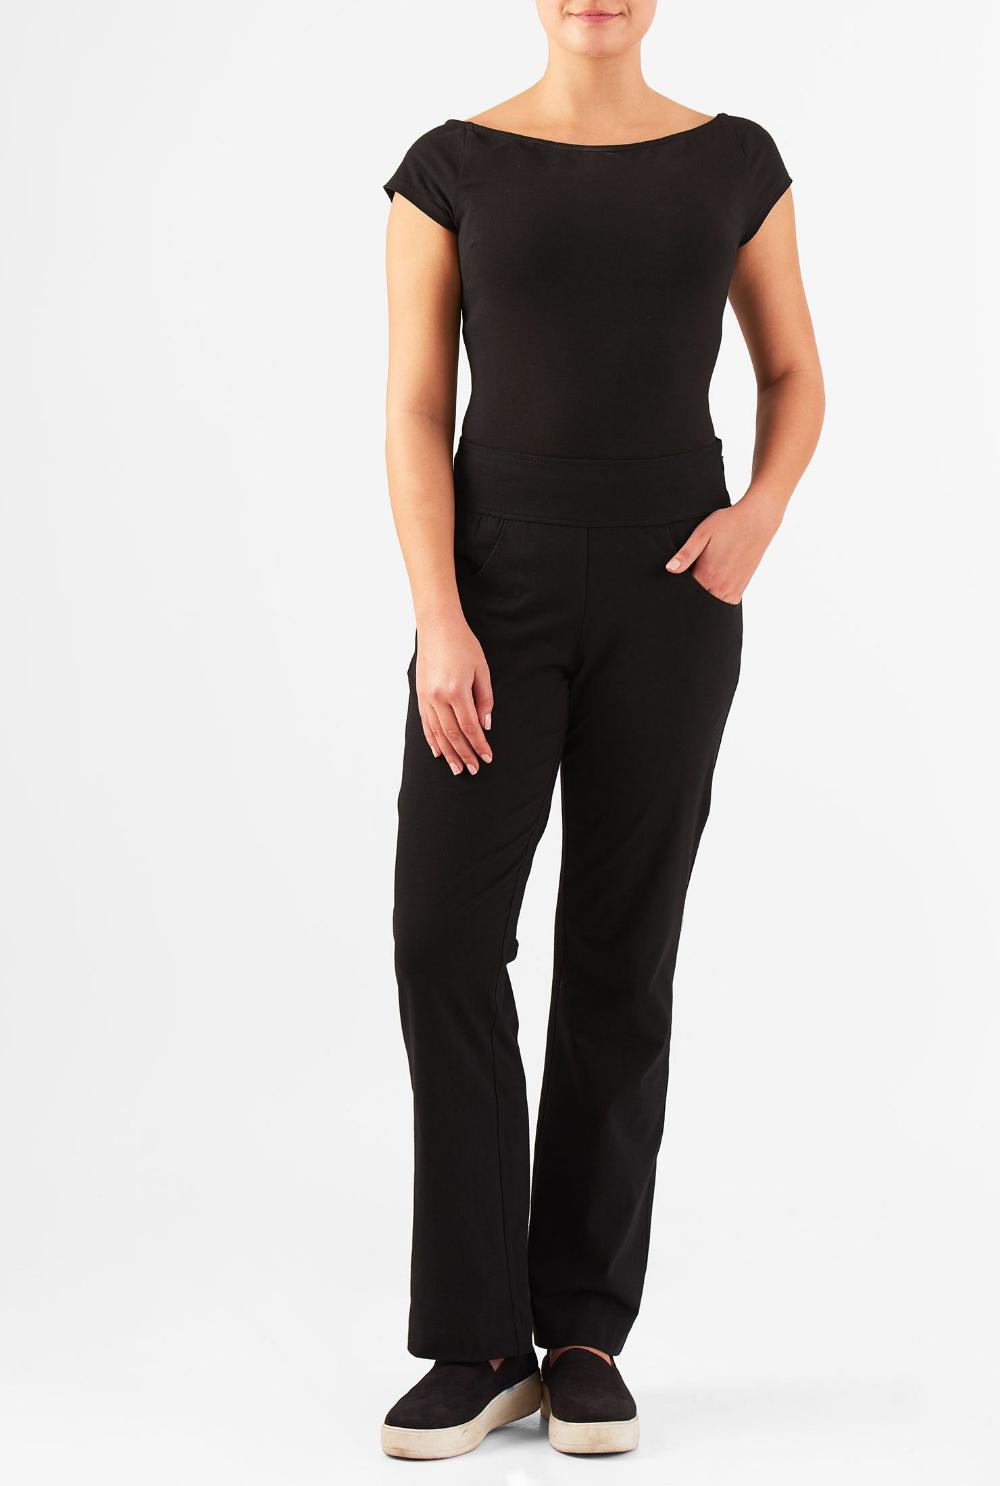 Women's Fashion Clothing 036W and Custom Fashion